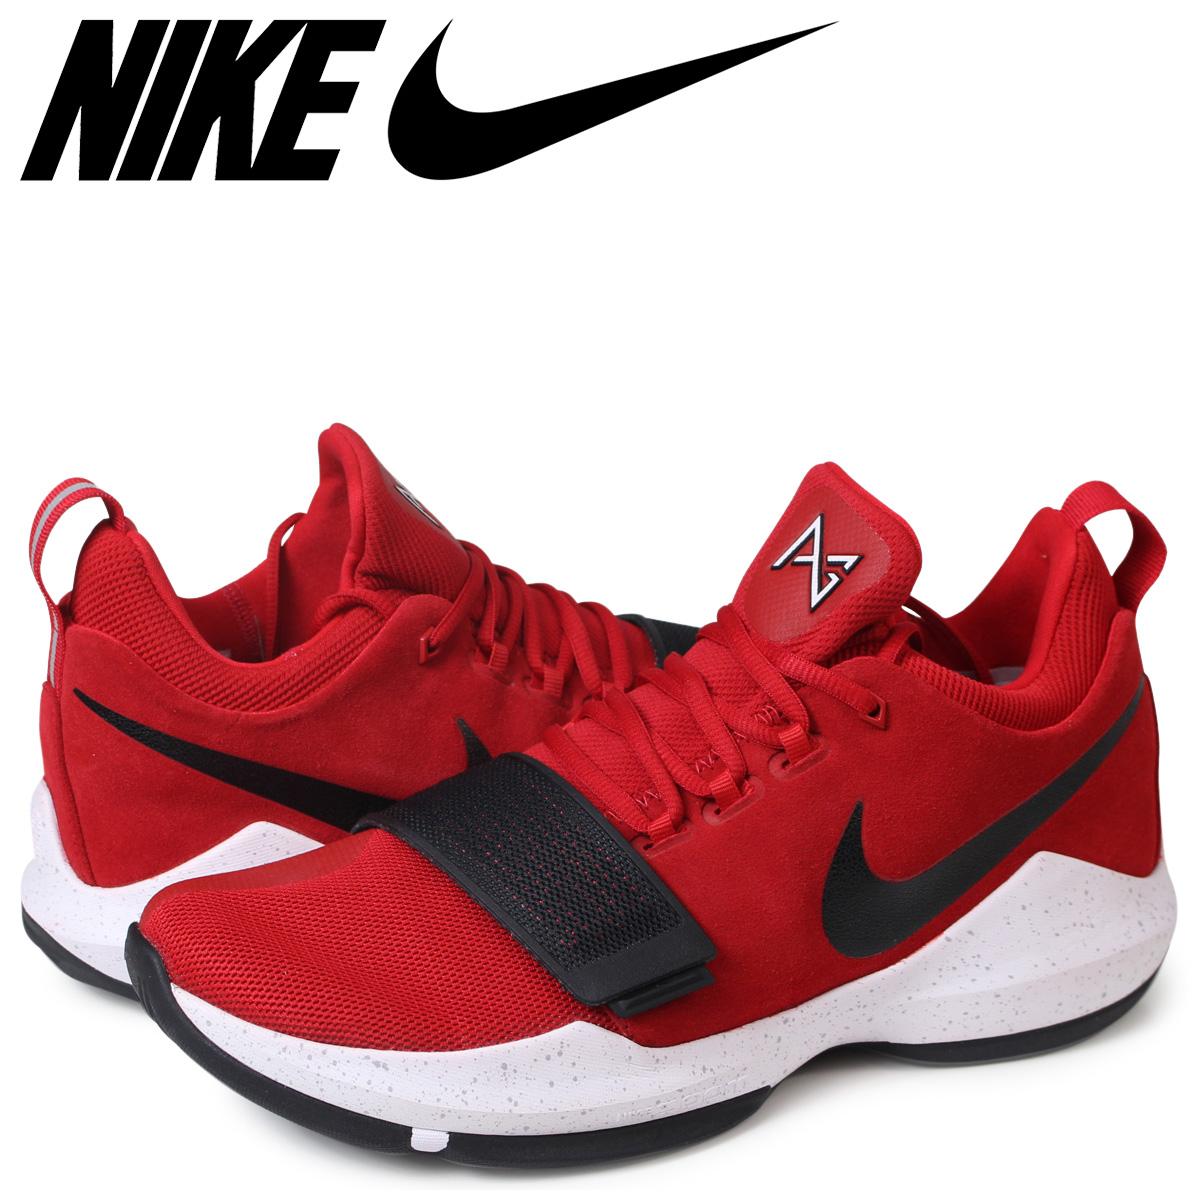 4e7ead9c686 ALLSPORTS  NIKE PG 1 EP Nike PG1 sneakers men 878